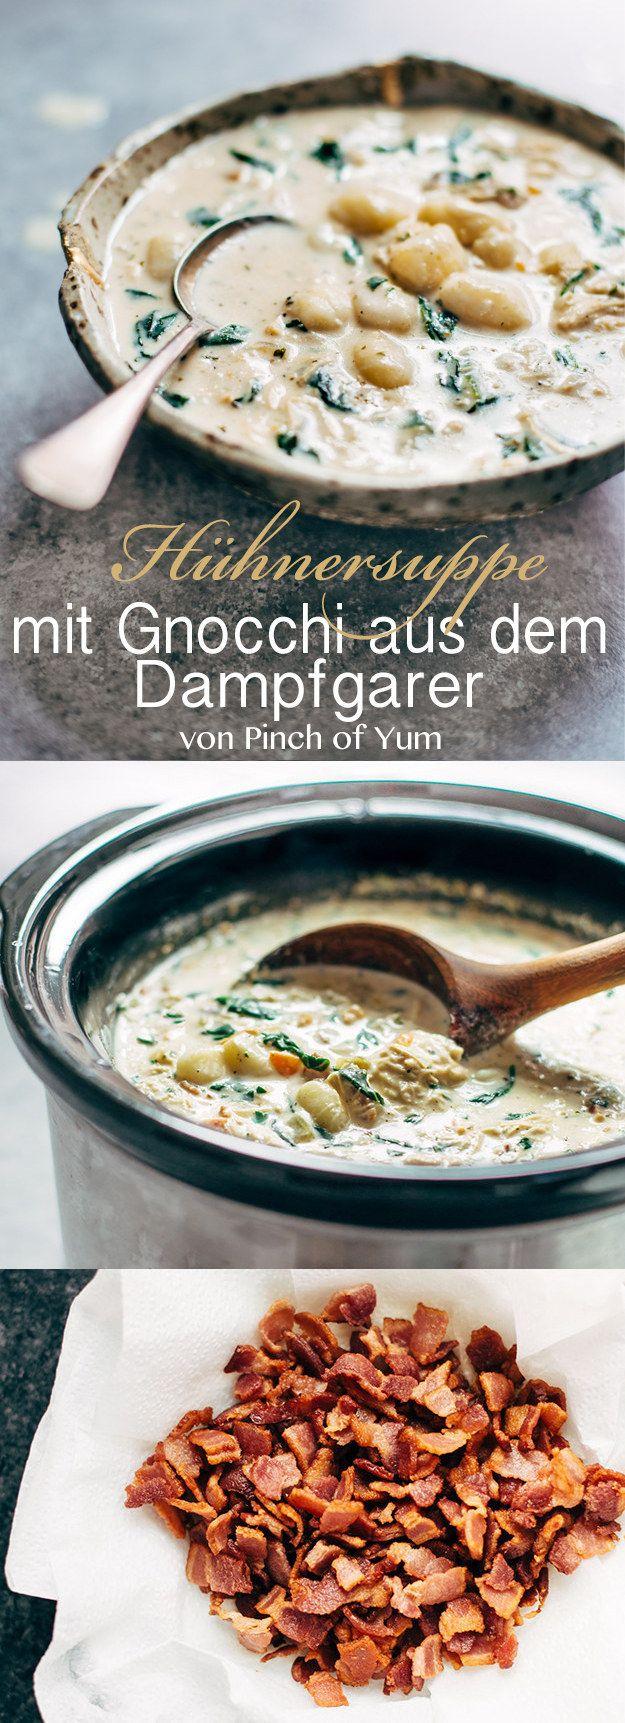 25+ best ideas about Dampfgarer mikrowelle on Pinterest | Kuchen ... | {Dampfgarer 42}